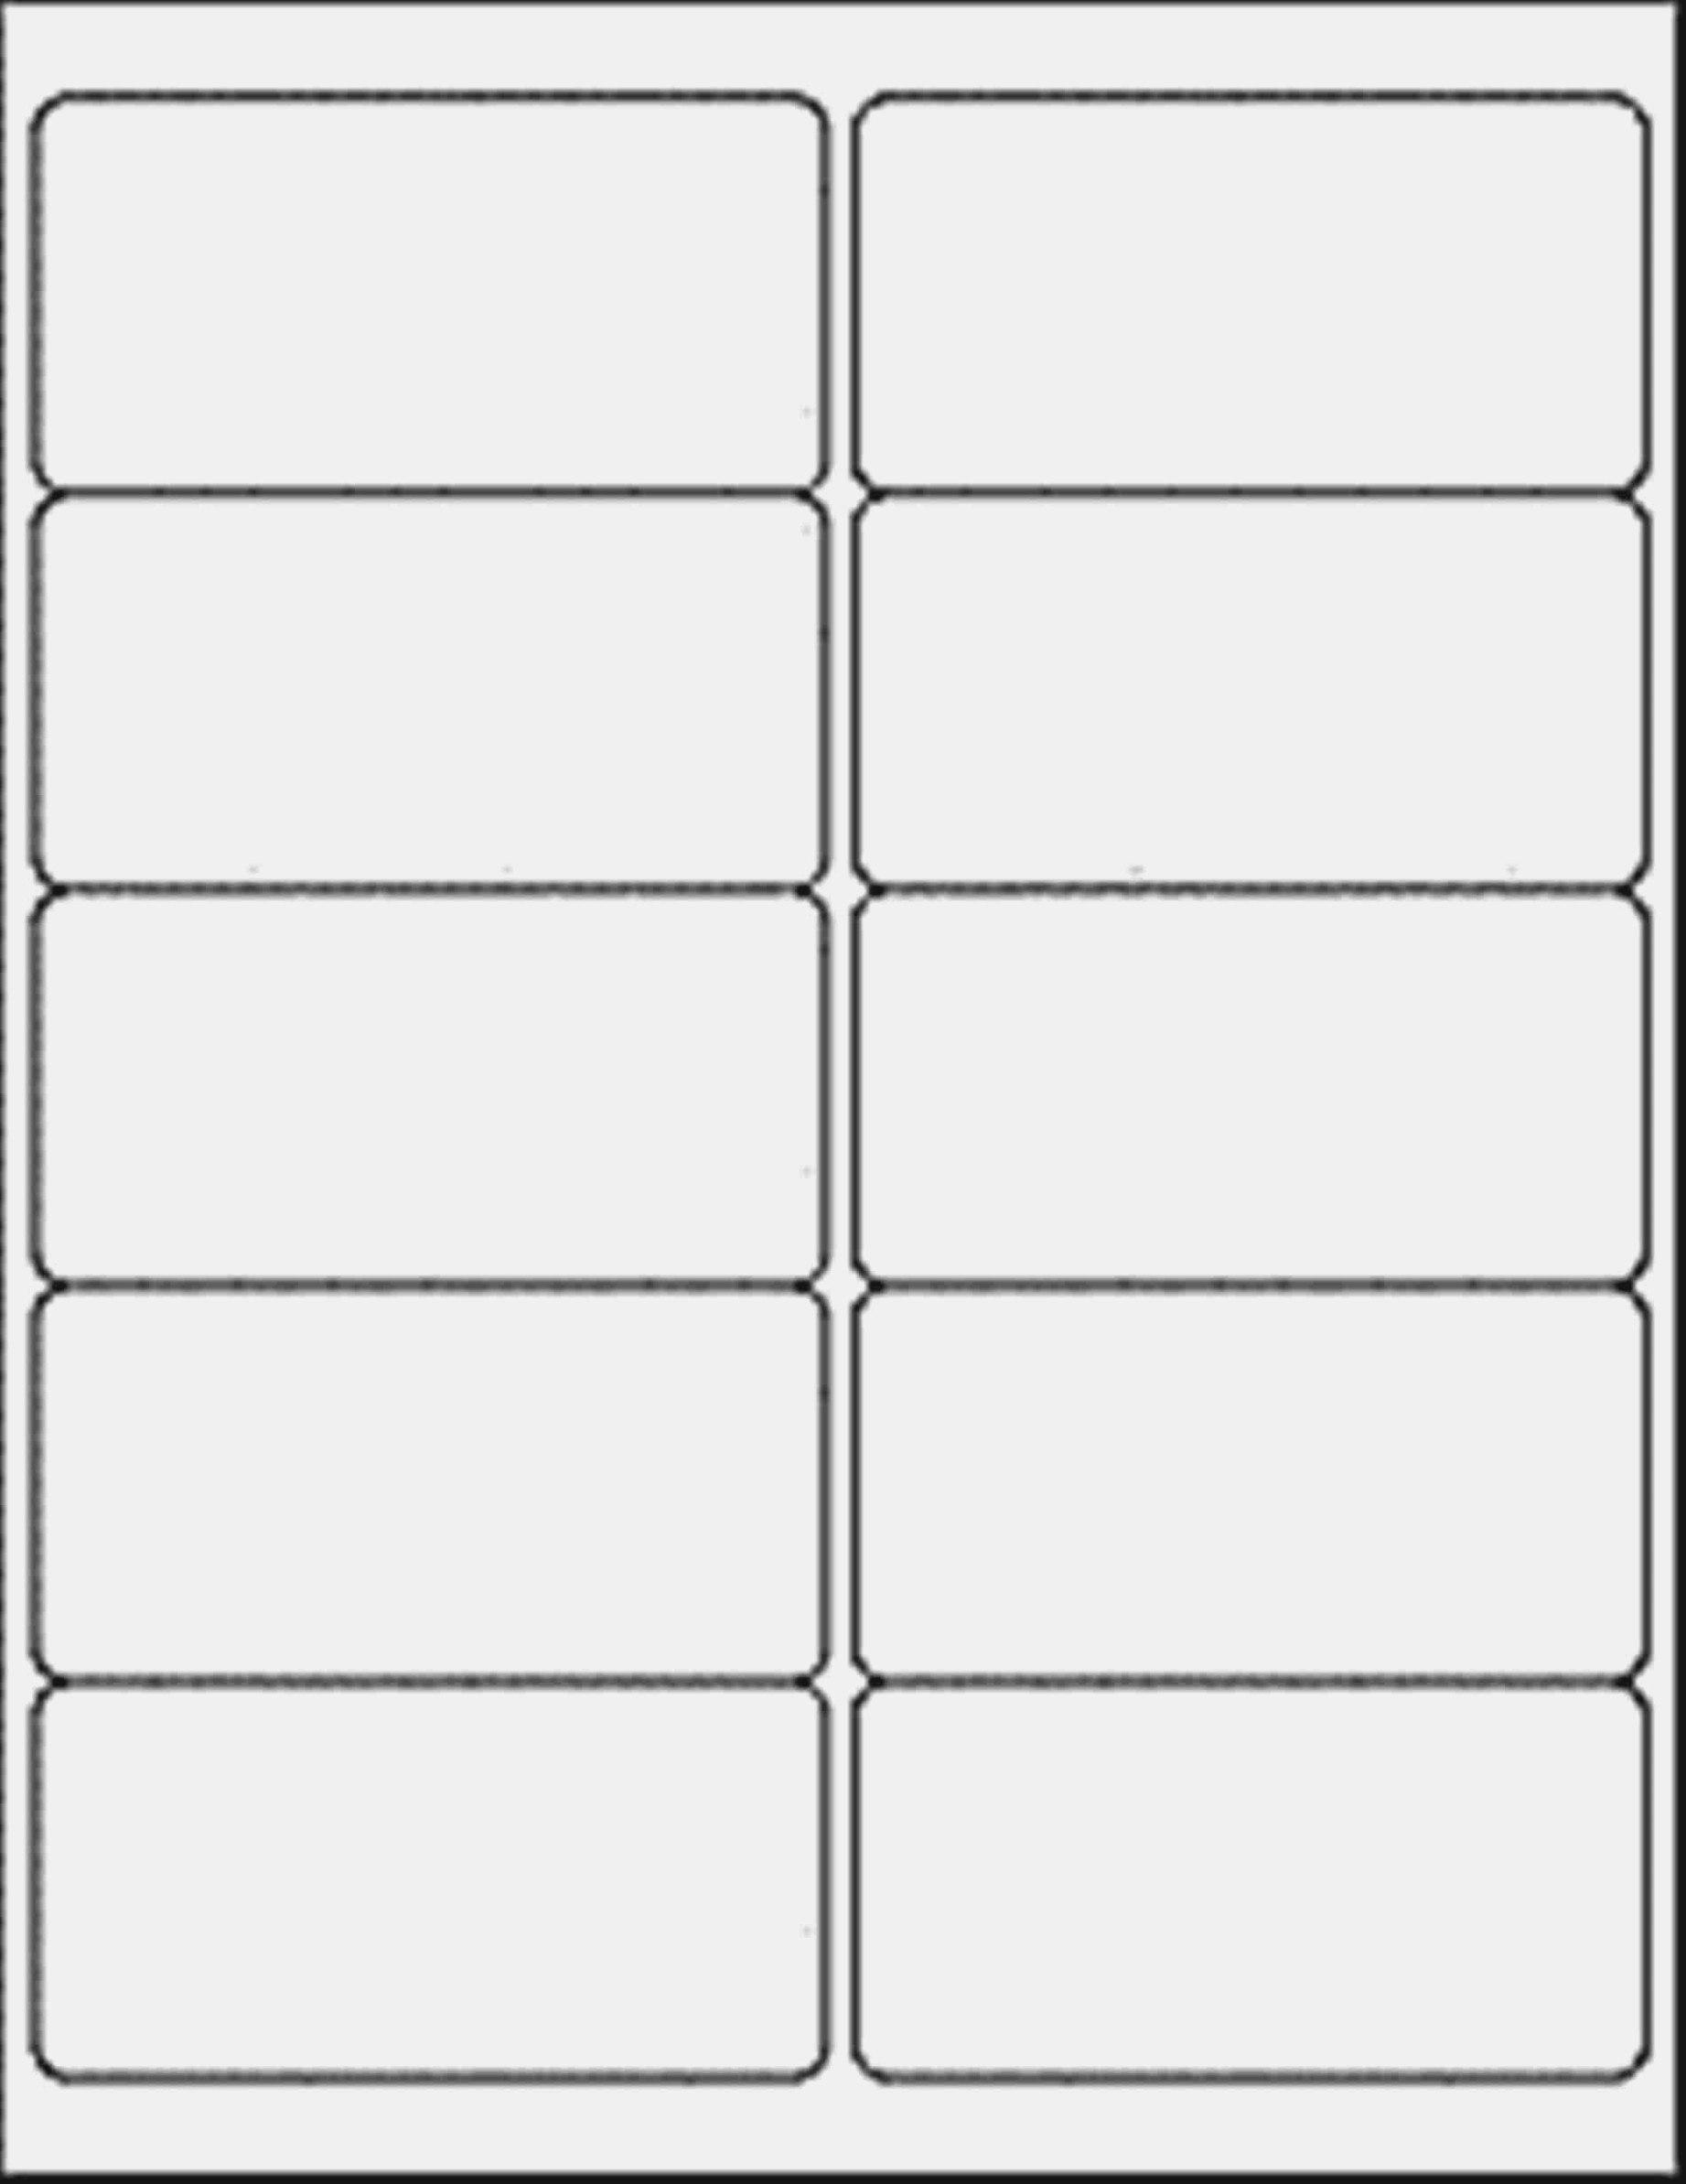 Word Label Template  Per Sheet  Template Designs And Ideas For Word Label Template 12 Per Sheet